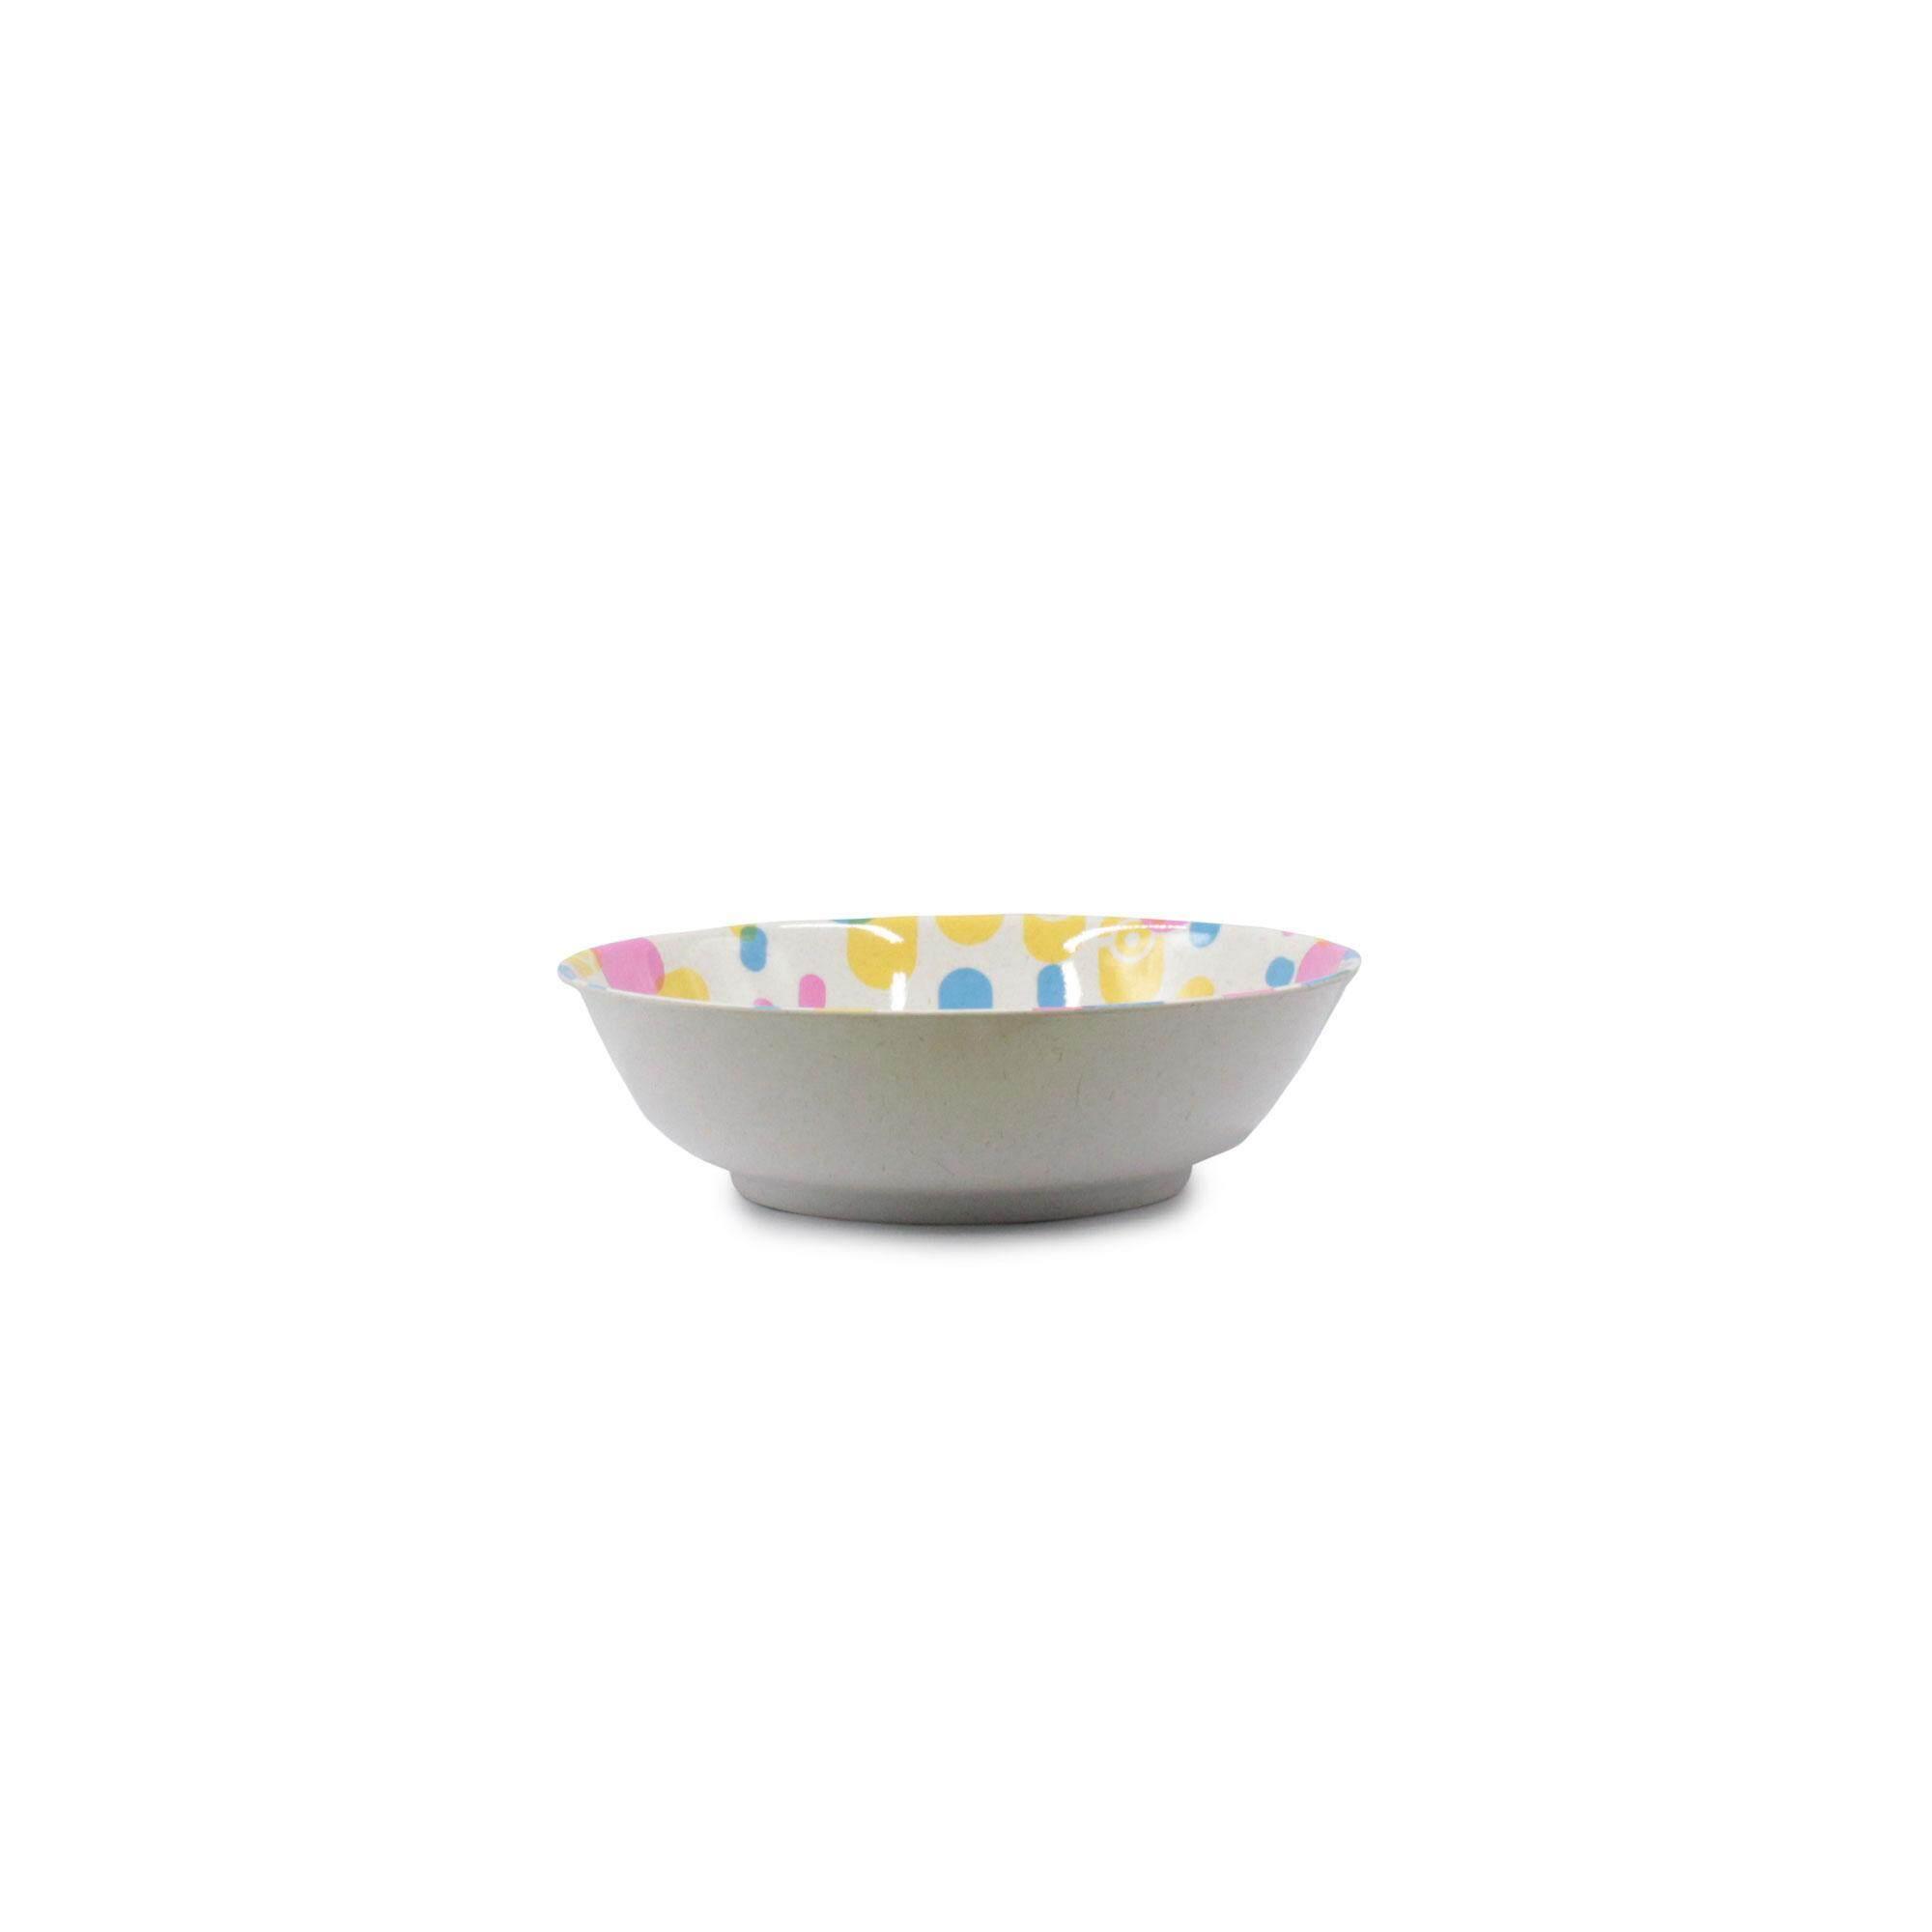 Despicable Me Minions 7.5 Inch Children Melamine Bowl